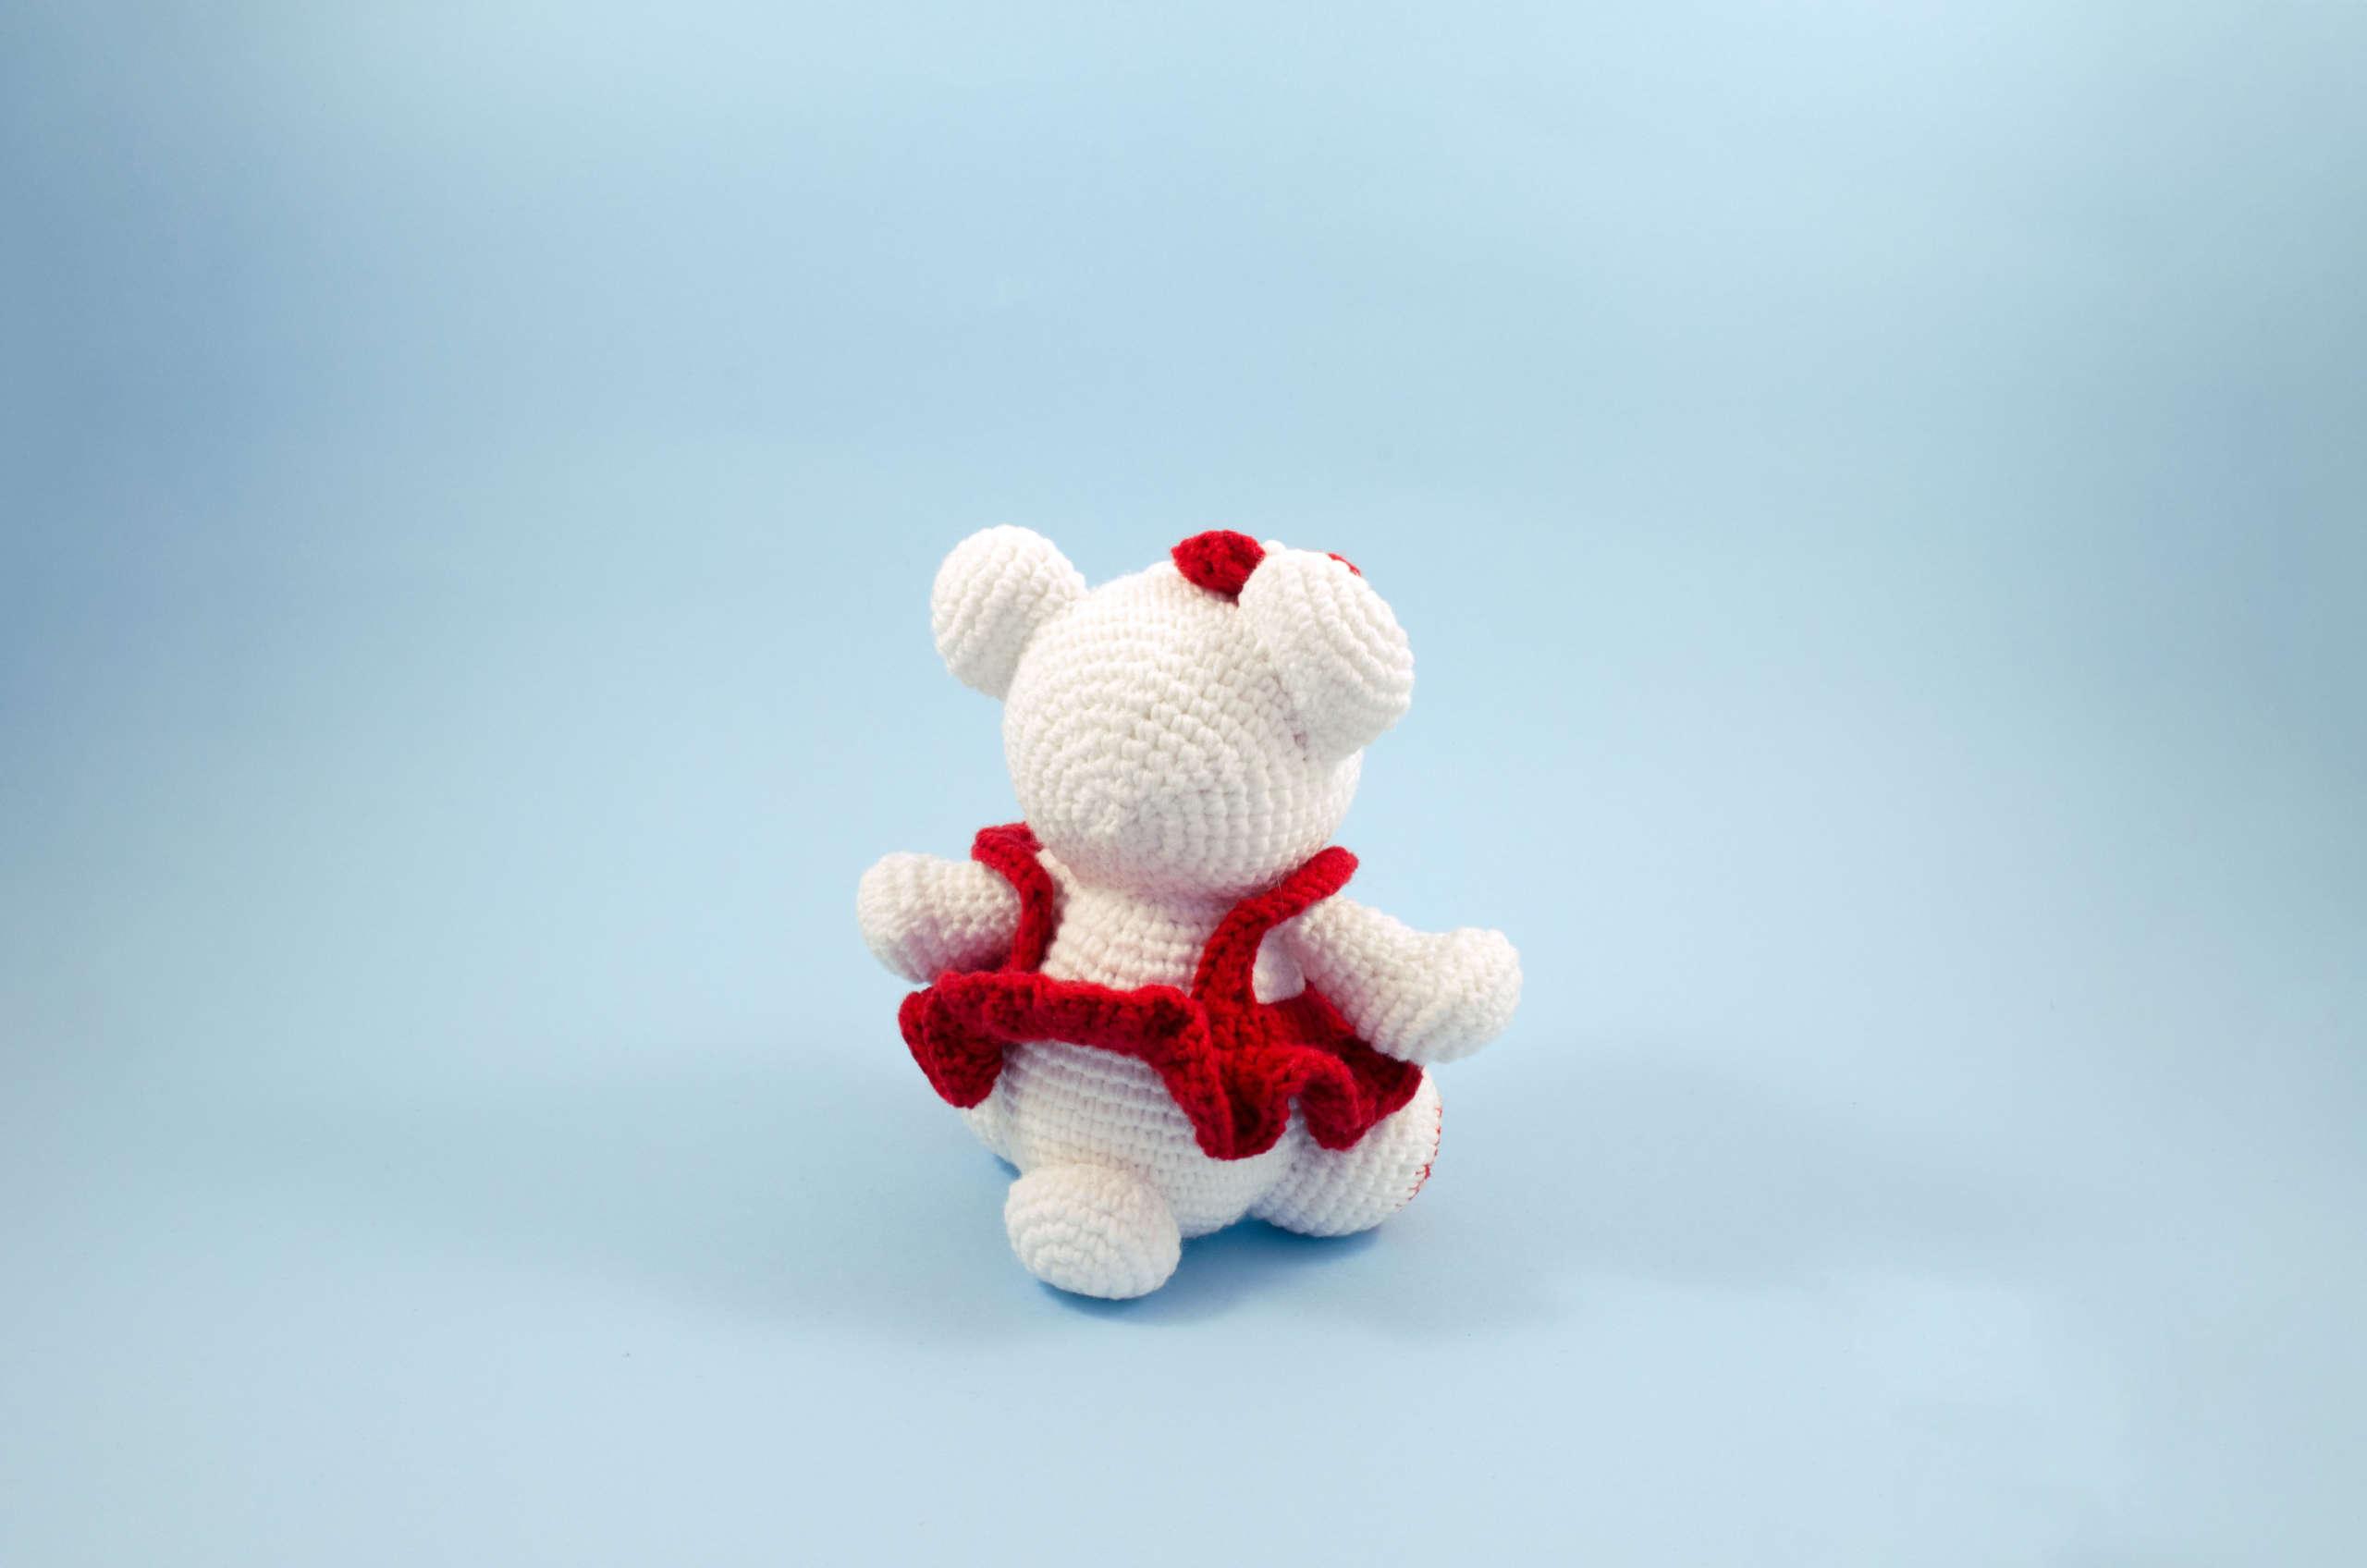 crochet snow white teddy bear back view